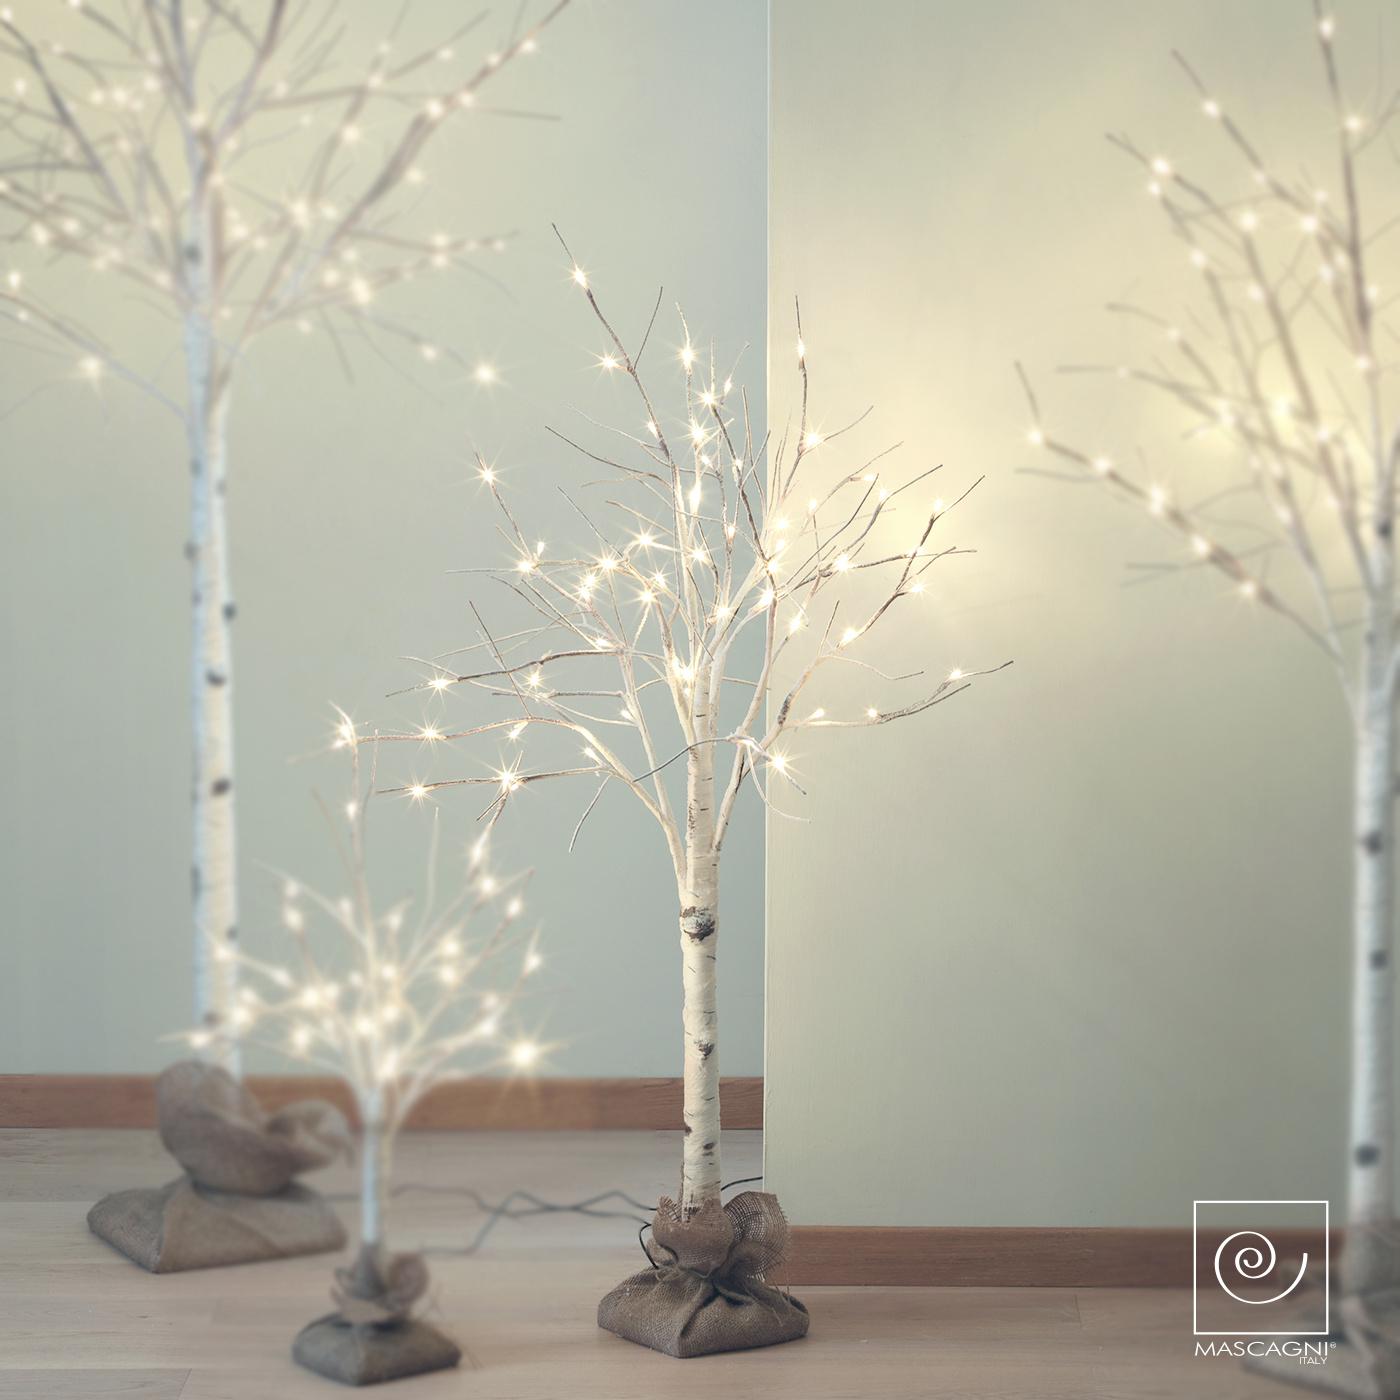 Art Mascagni LED TREE CM.125